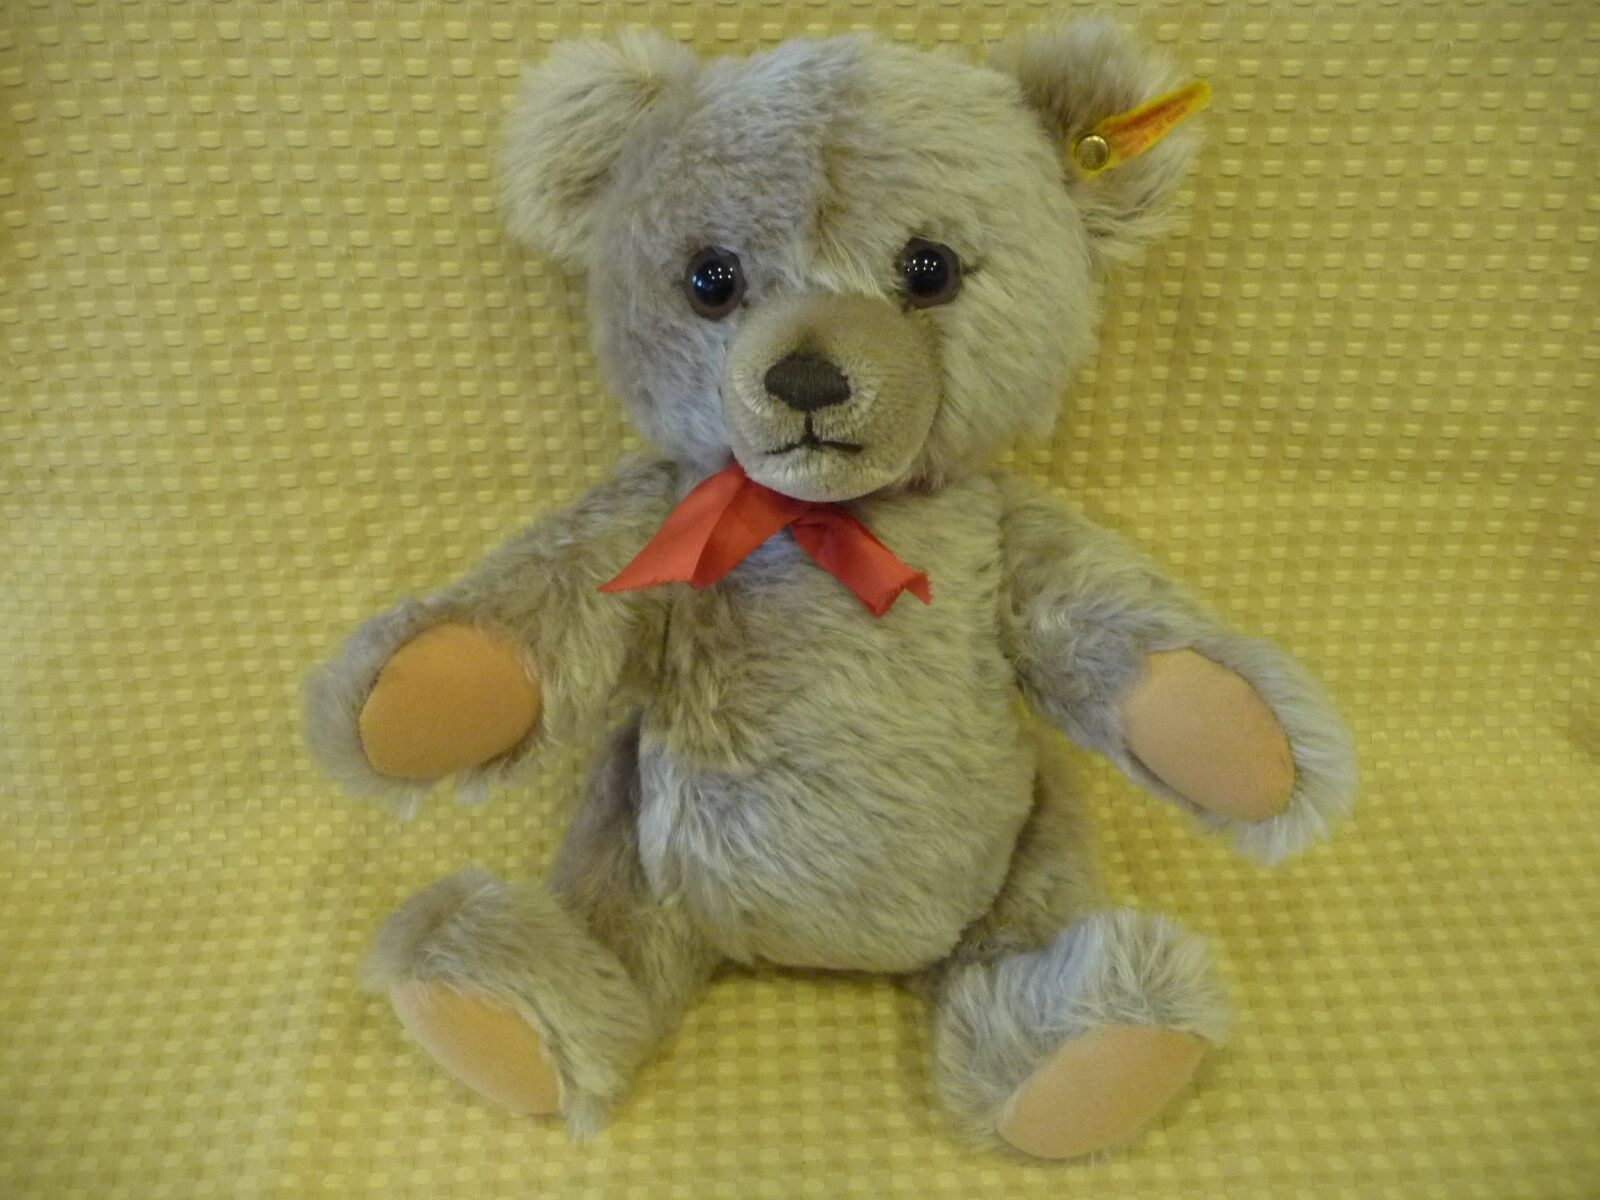 STteiff Teddy Brumbar Growling Bear EAN 011580